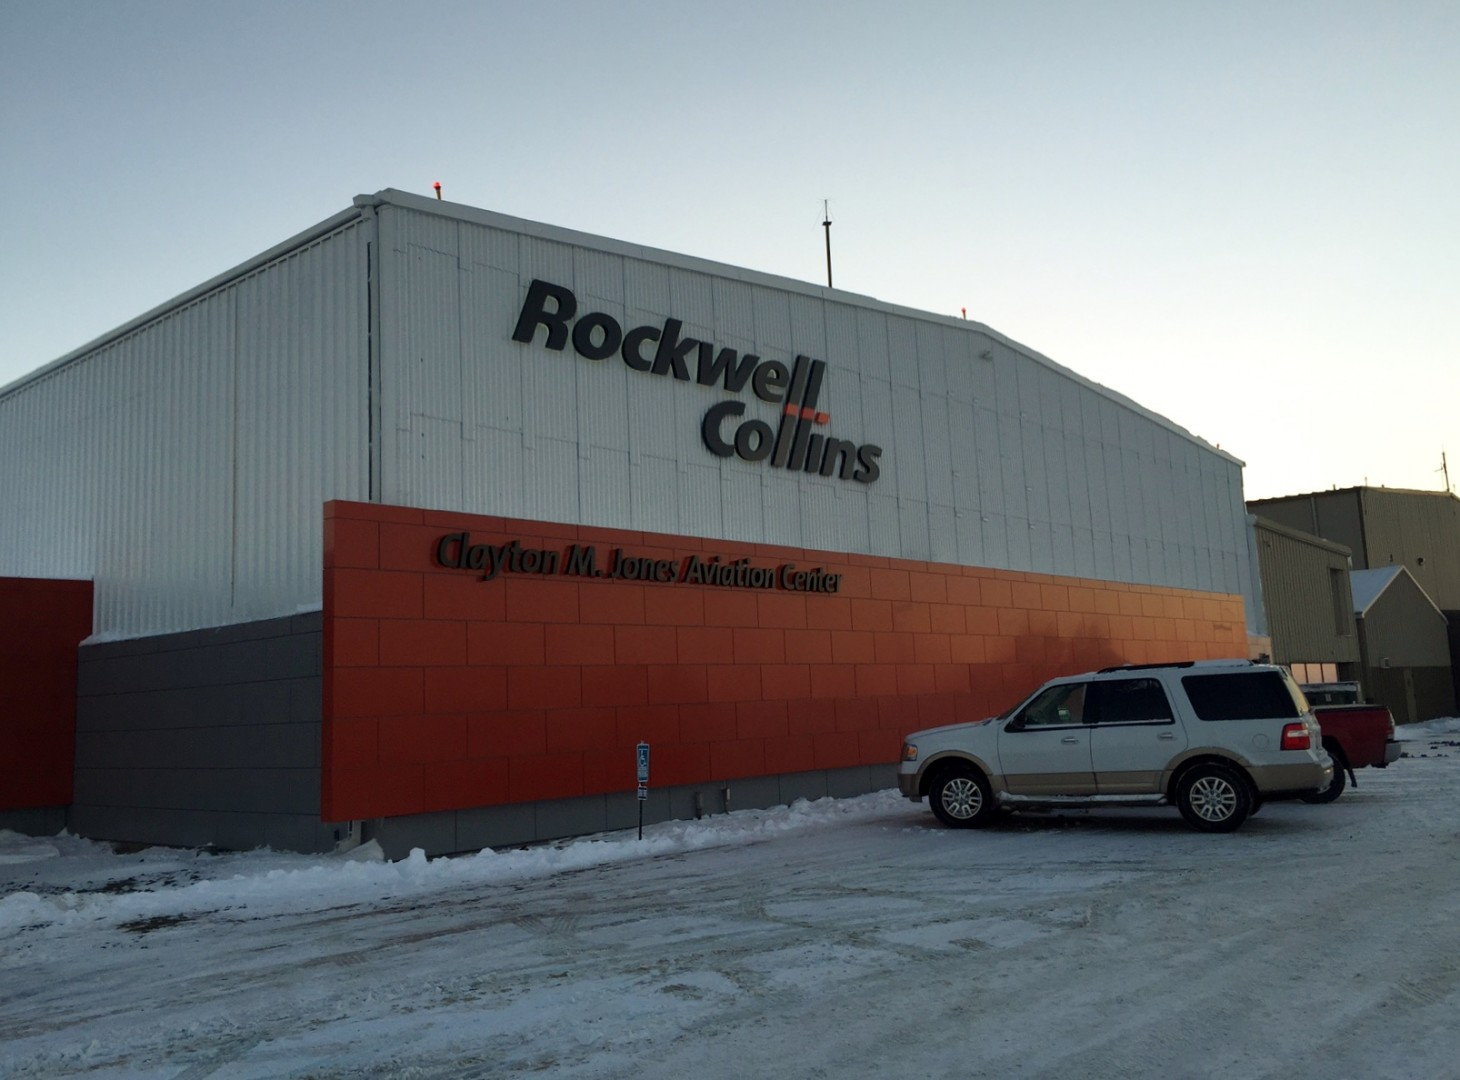 Rockwell Collins Aviation Hangar (Cedar Rapids)